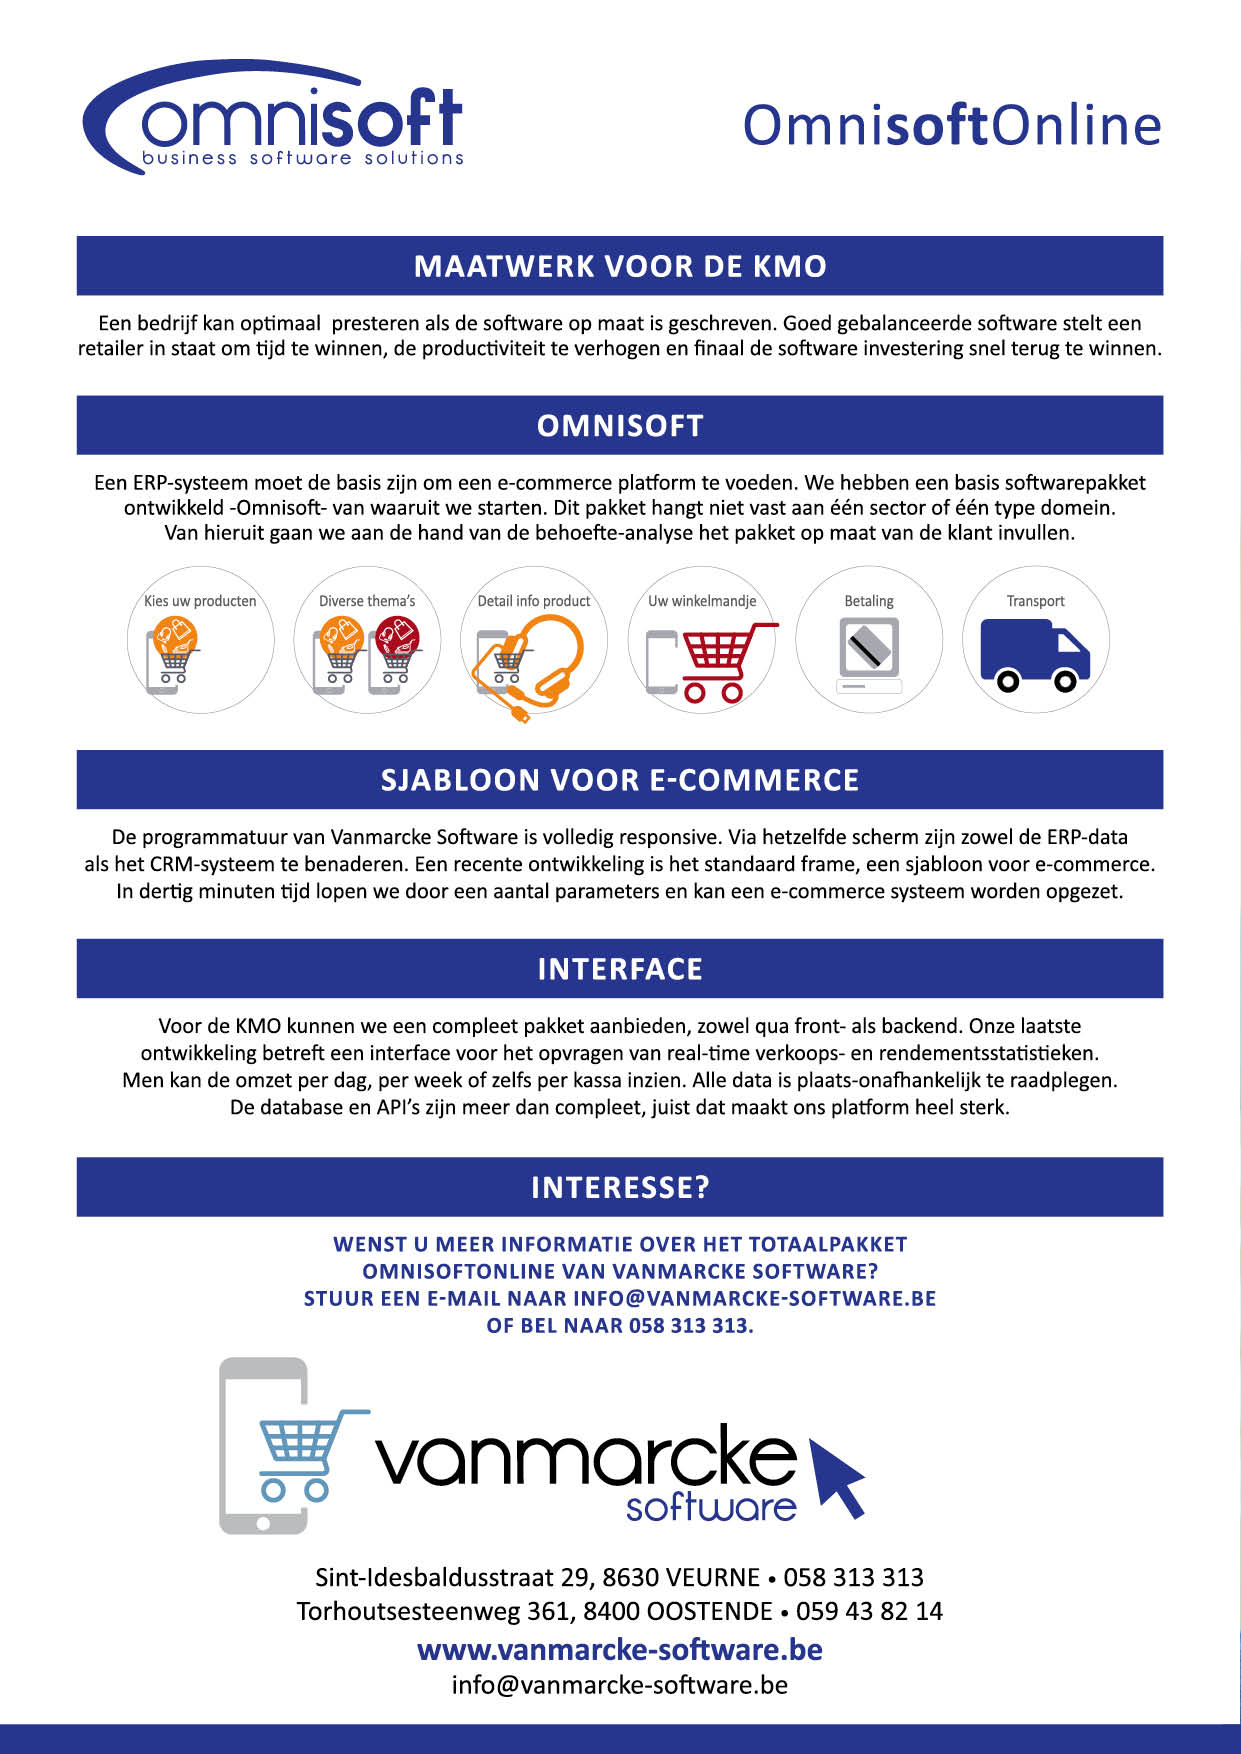 VANMARCKE•ECOMMERCE4